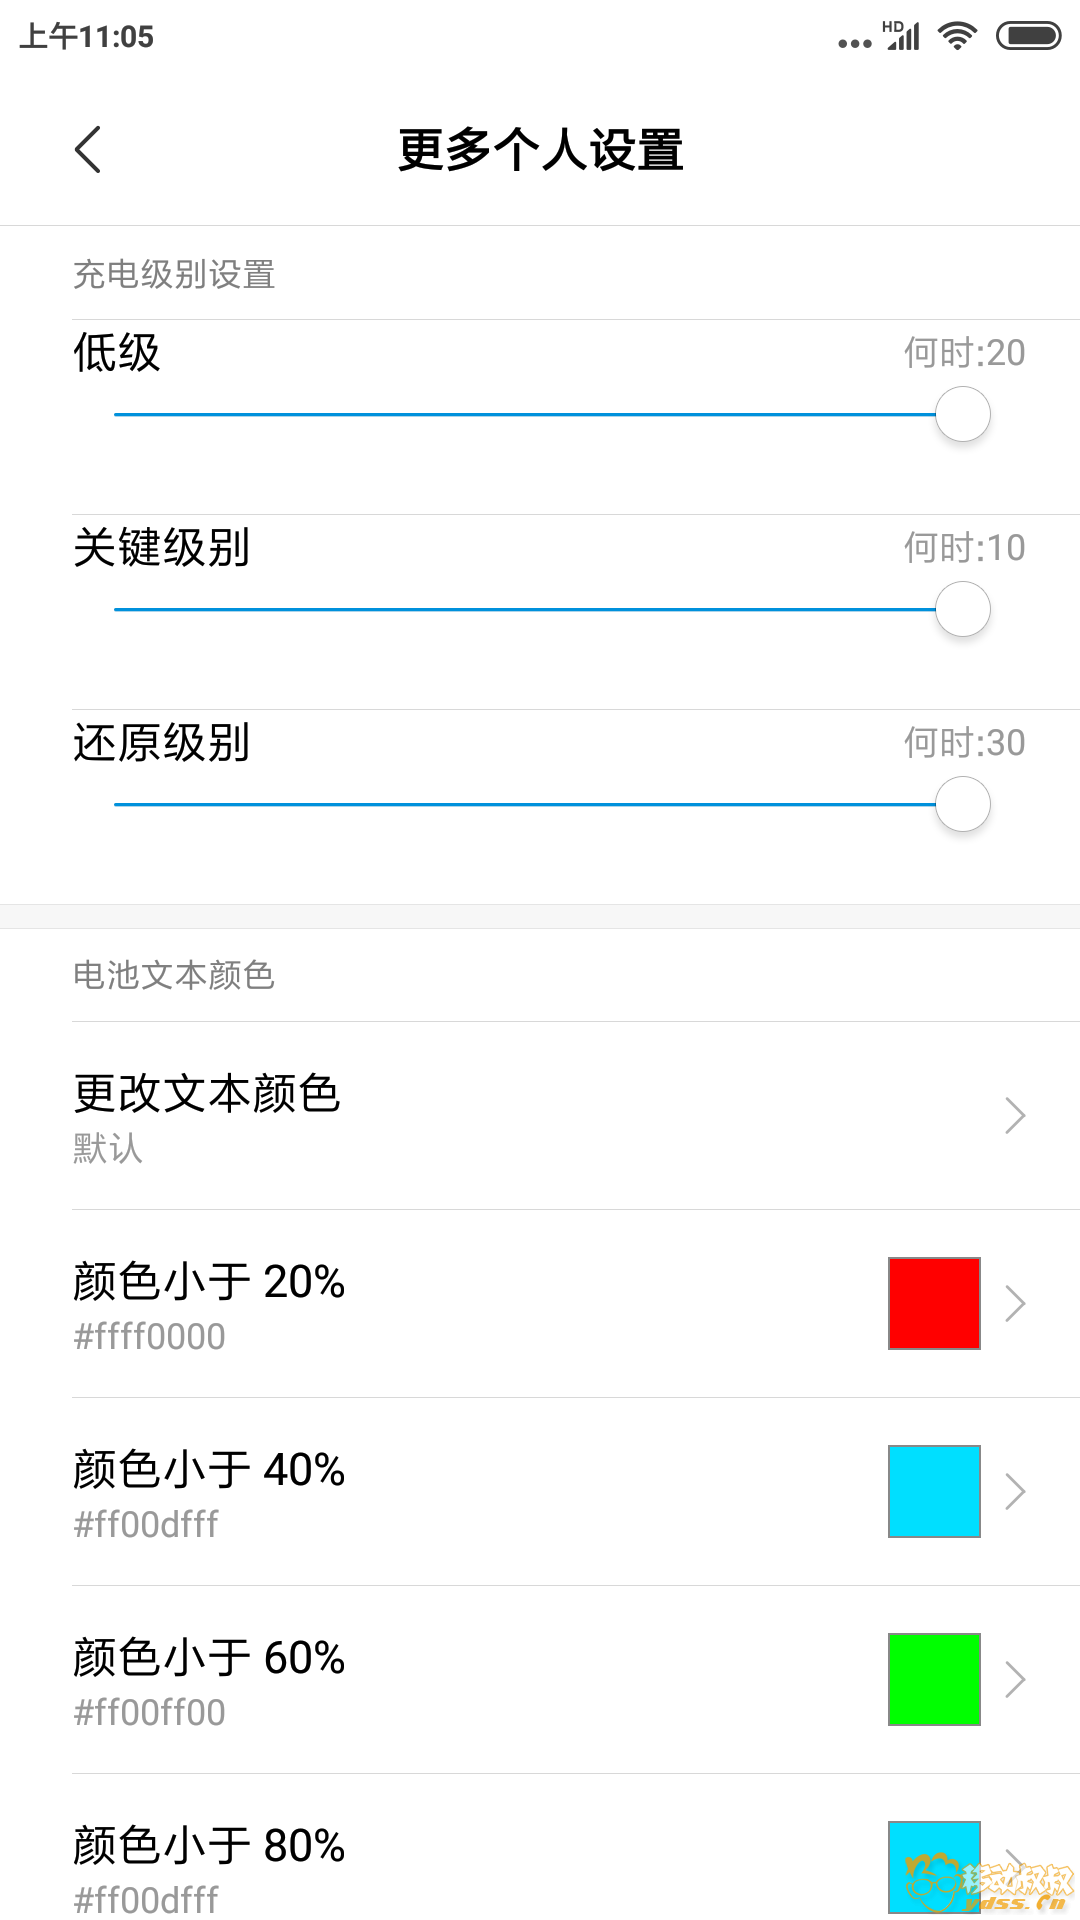 Screenshot_2018-07-02-11-05-41-167_com.android.settings.png